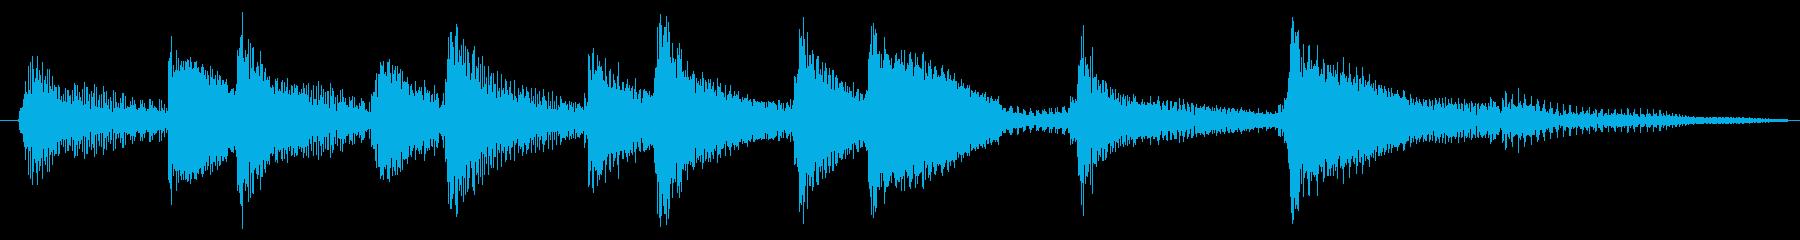 Summer / Okinawa / Japanese style / Sanshin jingle's reproduced waveform